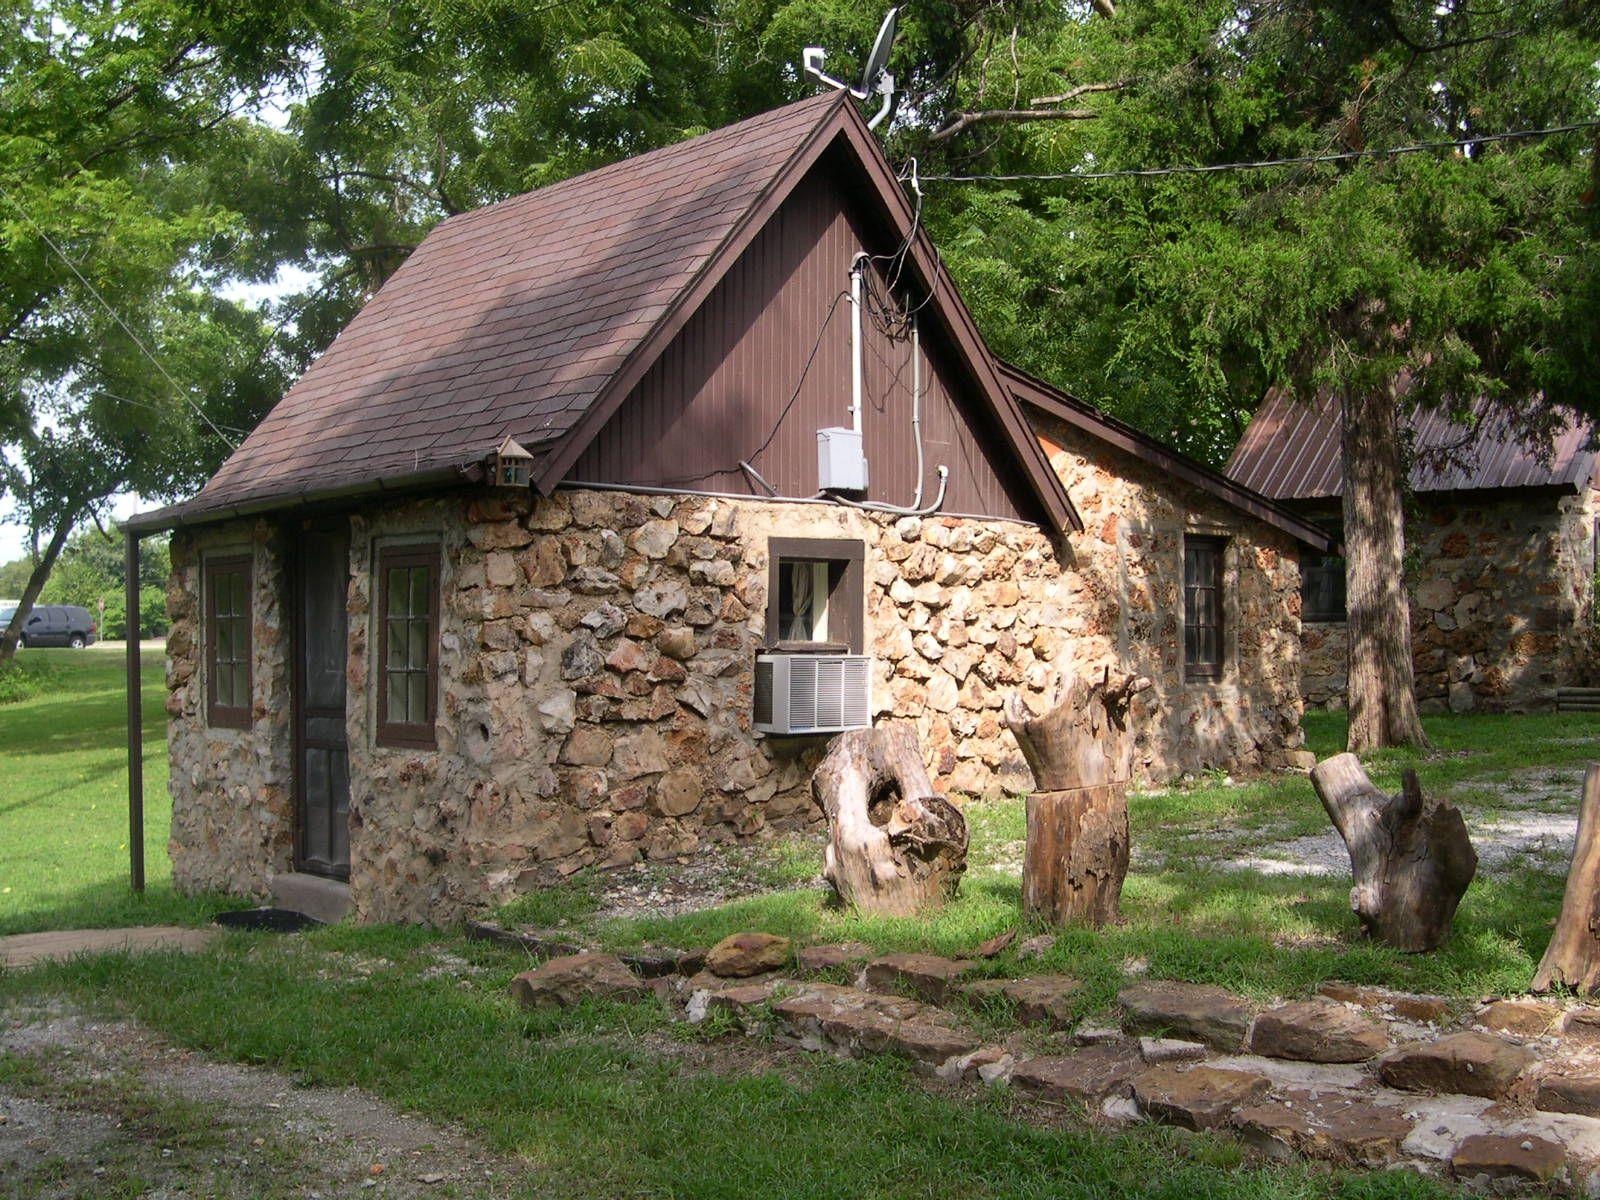 cottage lake ok a cabins rentals grand twslider cabin platinum featured home